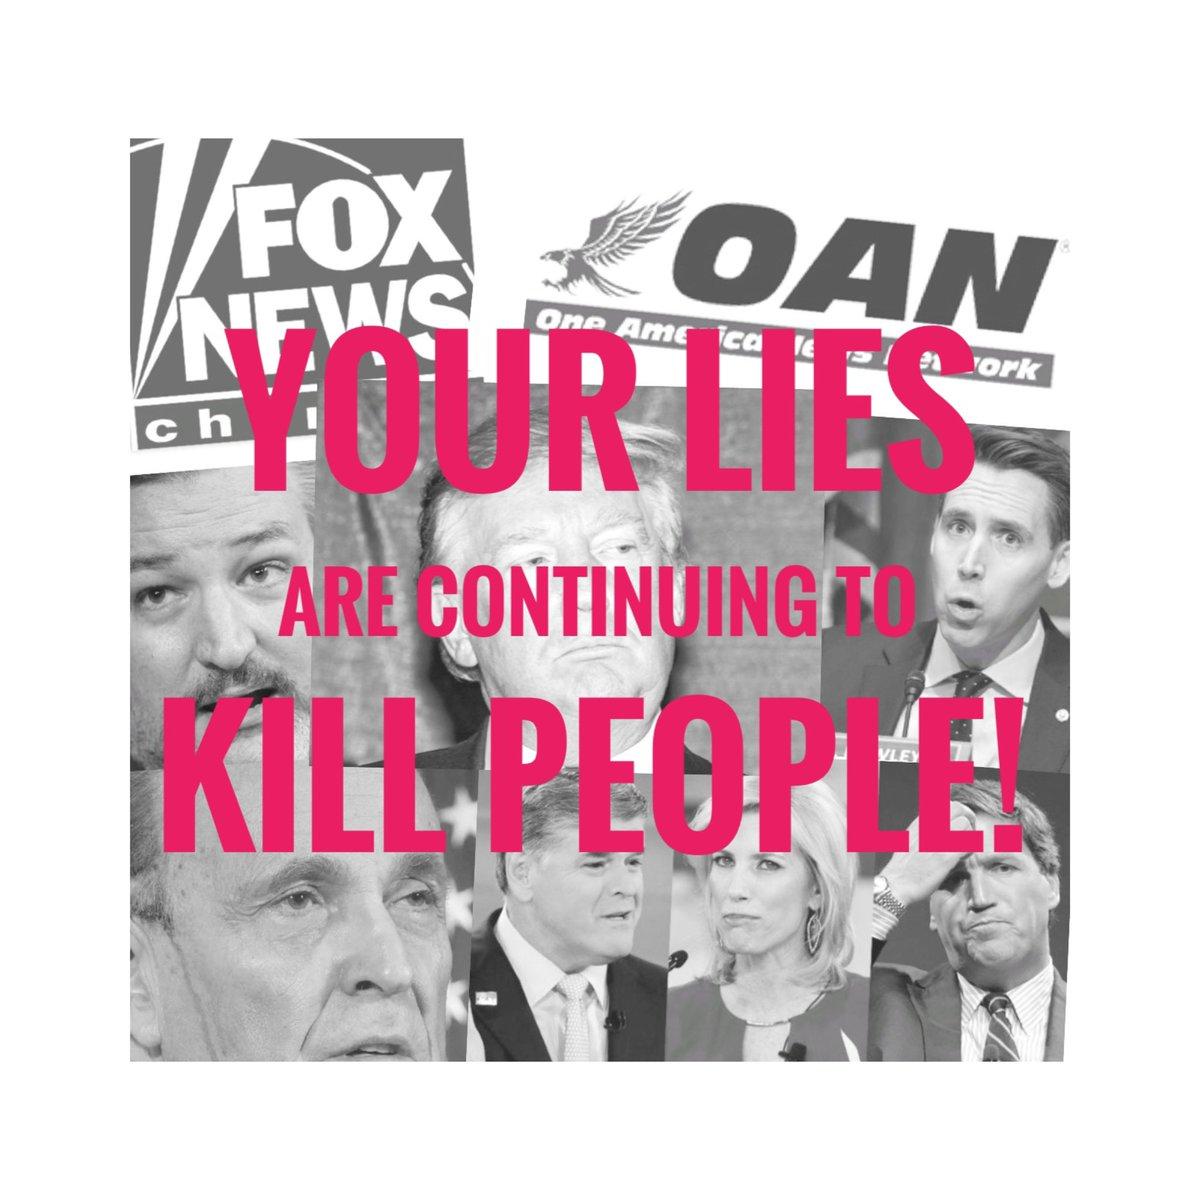 Your lies are killing!  #trump #news #world #history #twitter #vote #government #civil_war #insurrection #trumpsupporters #trumpbase #donaldtrump #foxnews #oan #cnn #msnbc#TheBigLie #TrumpTreason #RemoveThemAll #RemoveTheTraitors @foxnews @cnn @msnbc